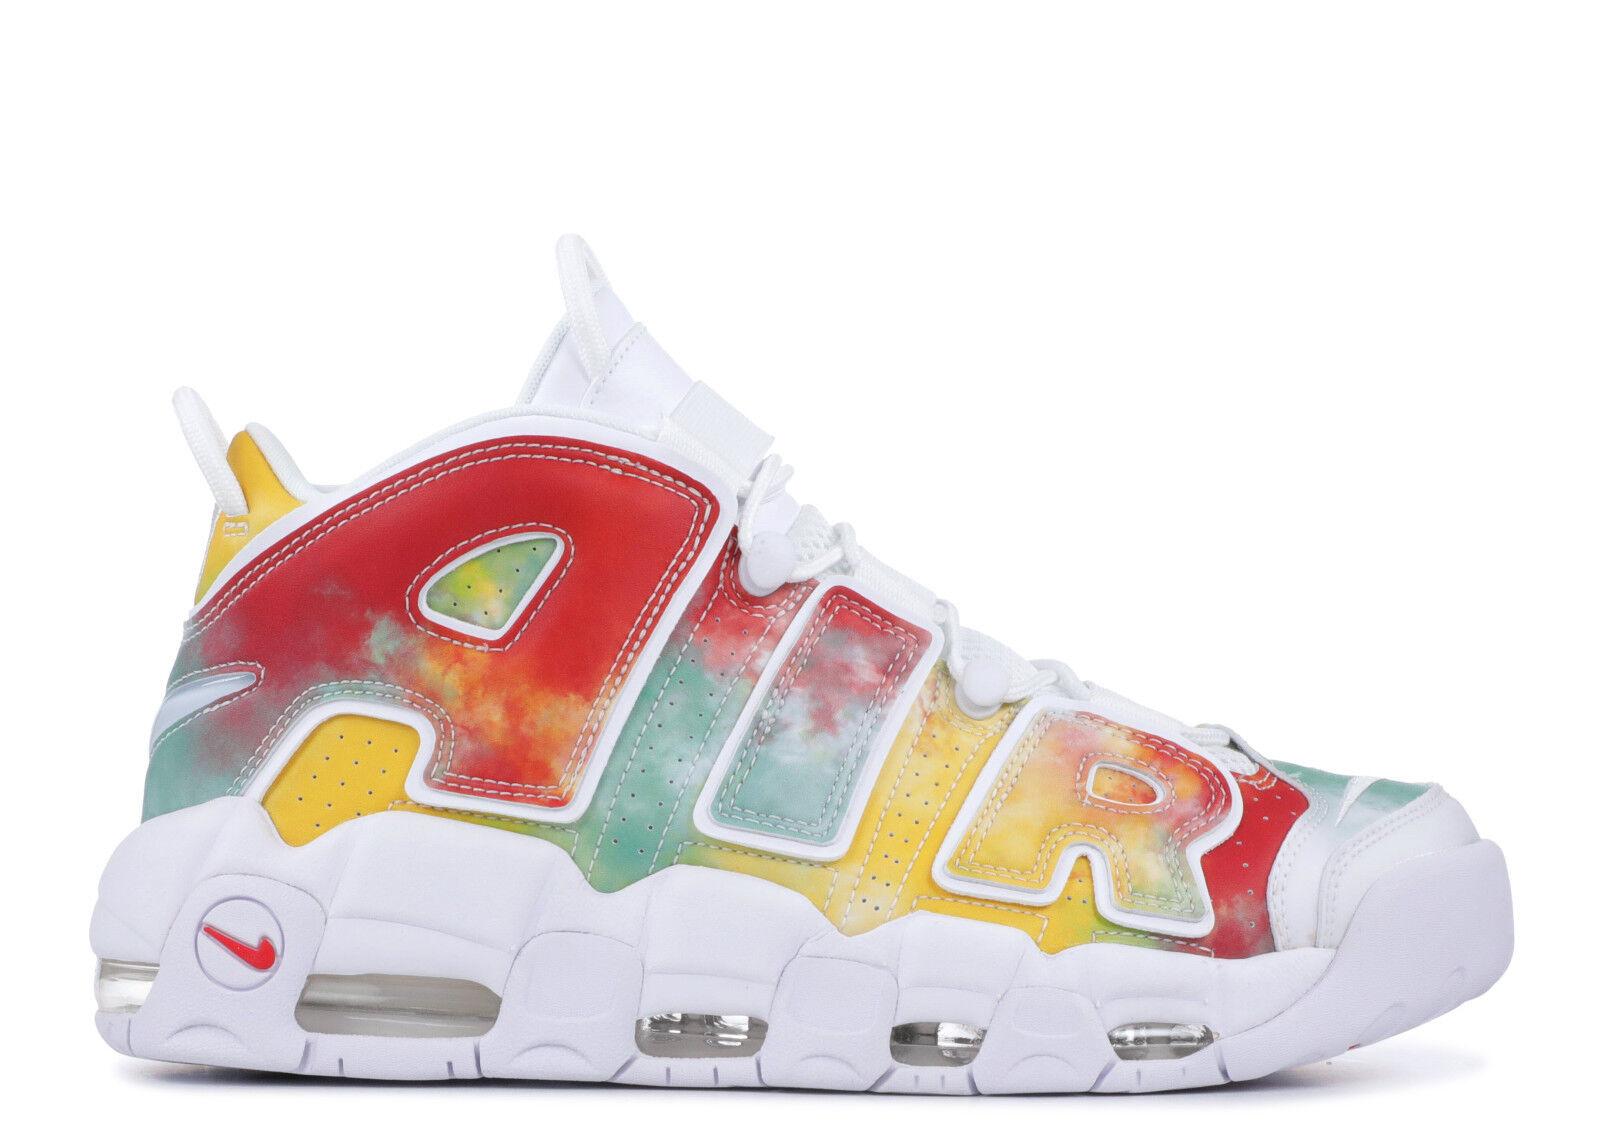 2018 2018 2018 Nike Air More Uptempo Retro QS UK Multicolor Size 14. AV3809-700 Jordan e05a94